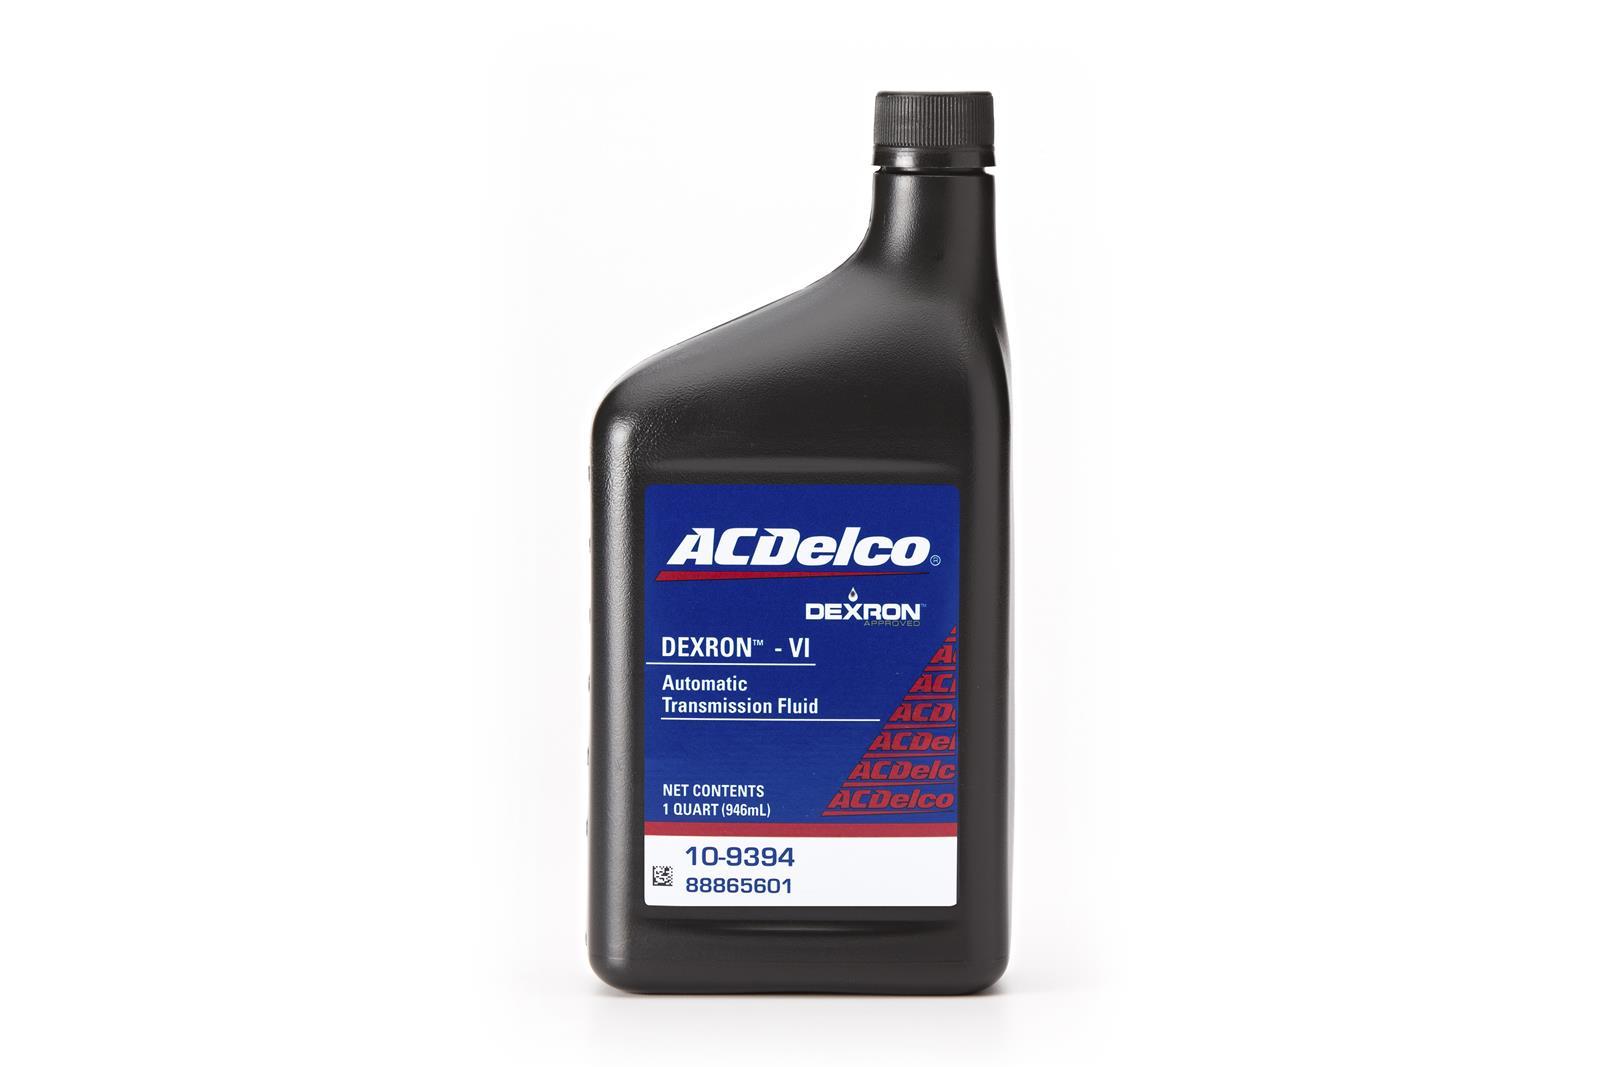 ACDelco DEXRON-VI Automatic Transmission Fluid 10-9394